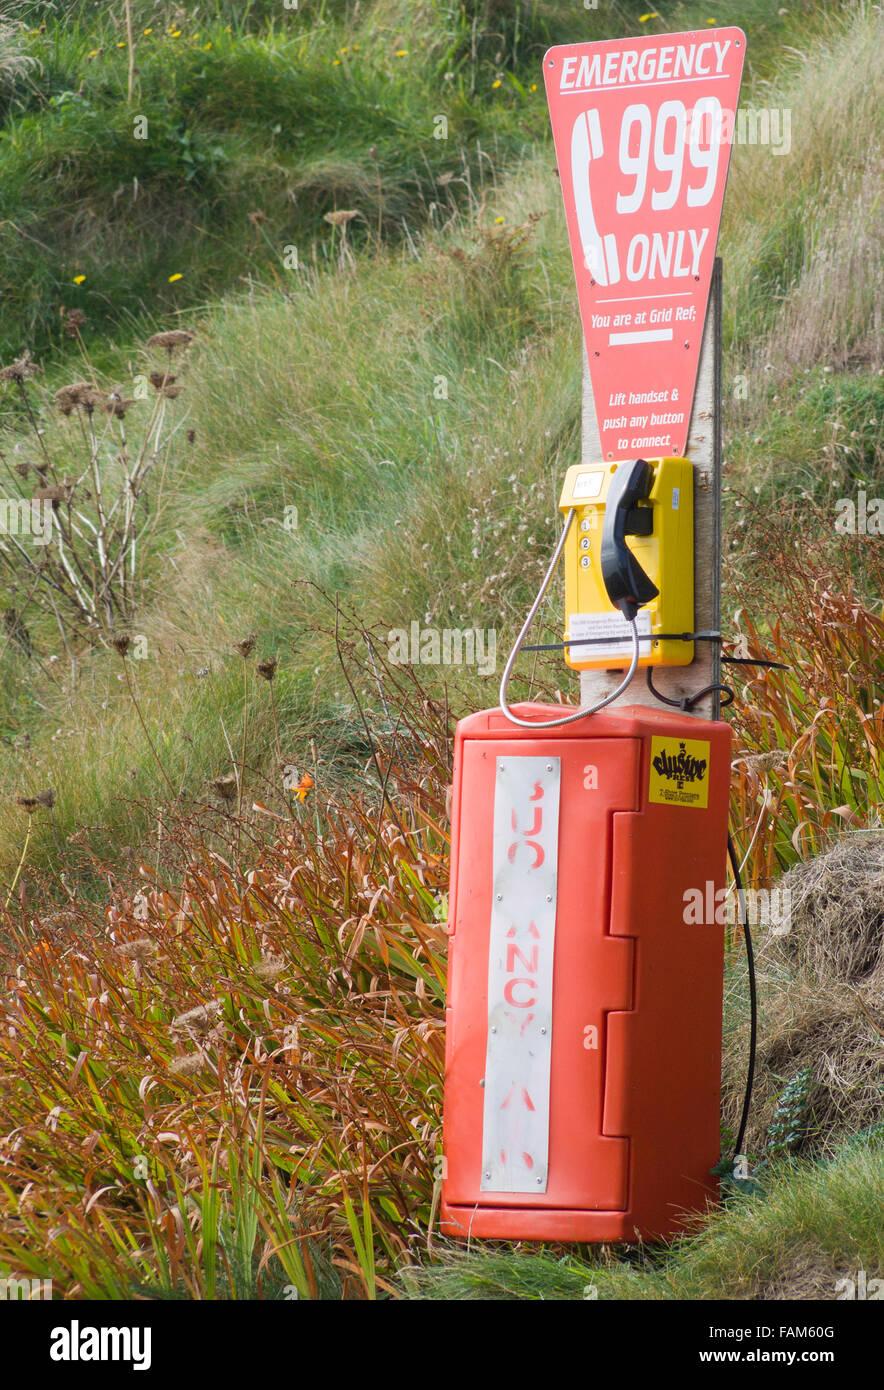 Emergency 999 Telephone in a Coastal Setting, Cornwall, England, UK - Stock Image